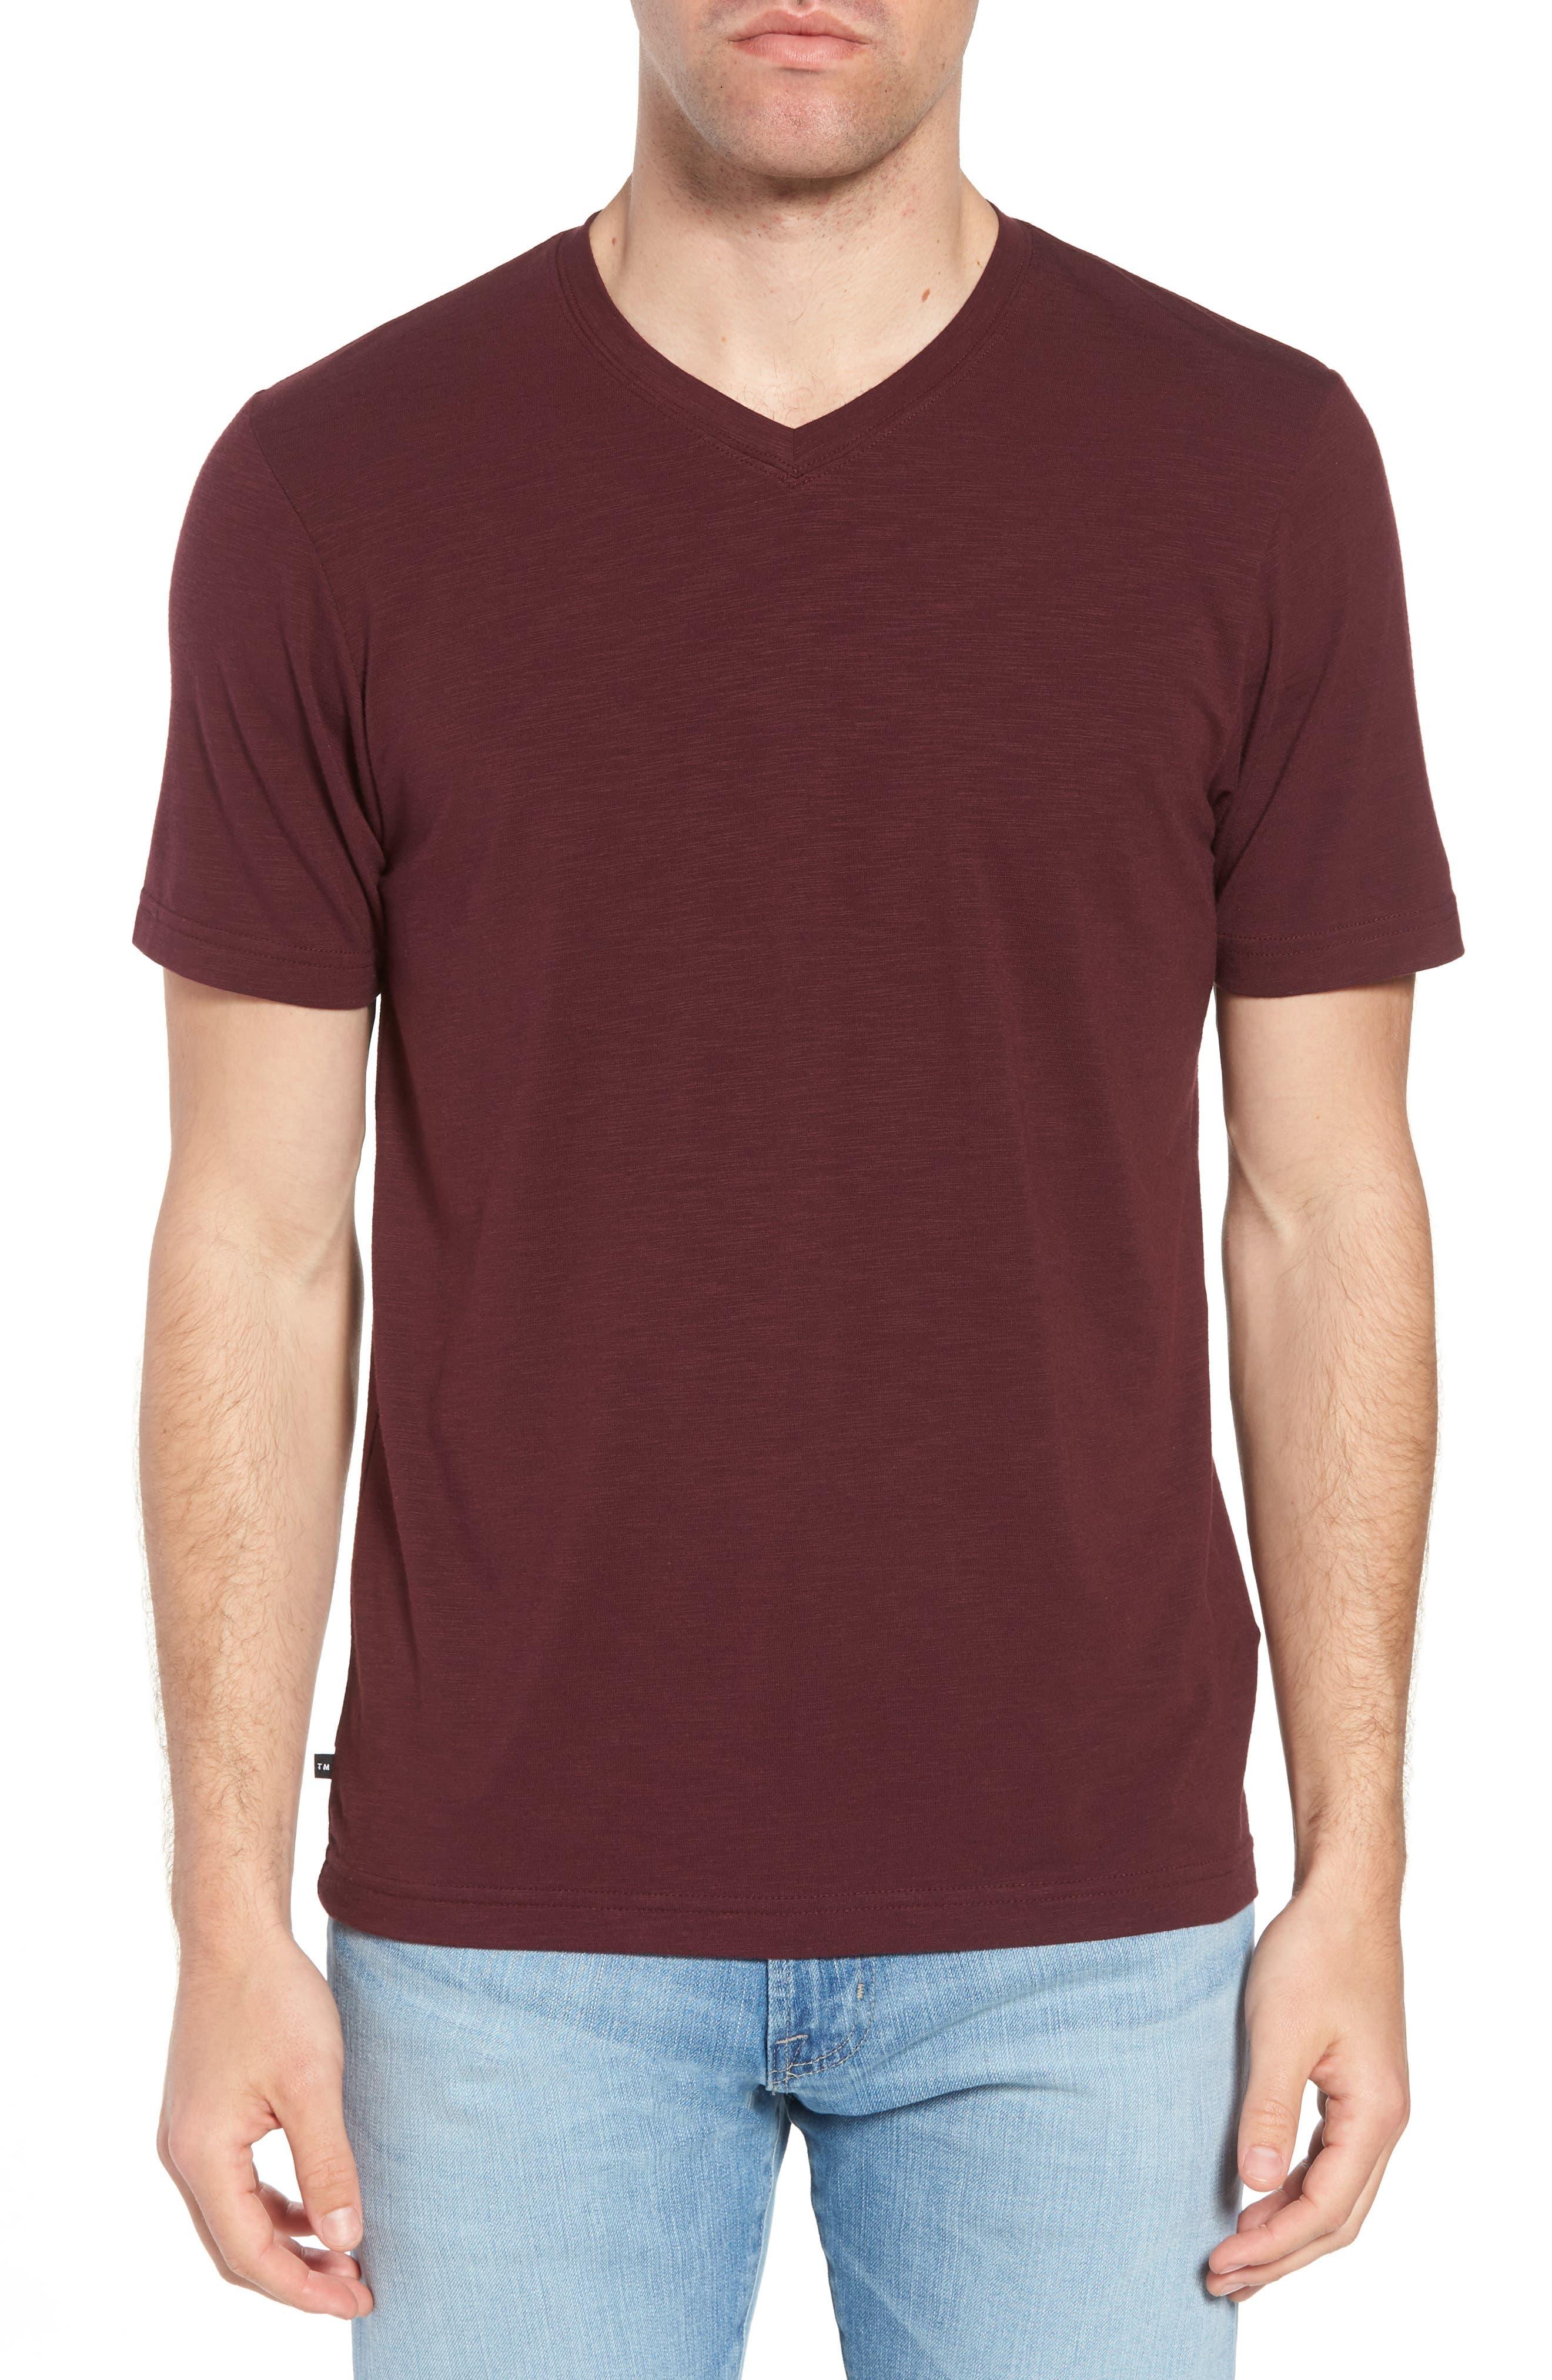 Main Image - Travis Mathew 'Trumbull' Trim Fit Slubbed T-Shirt